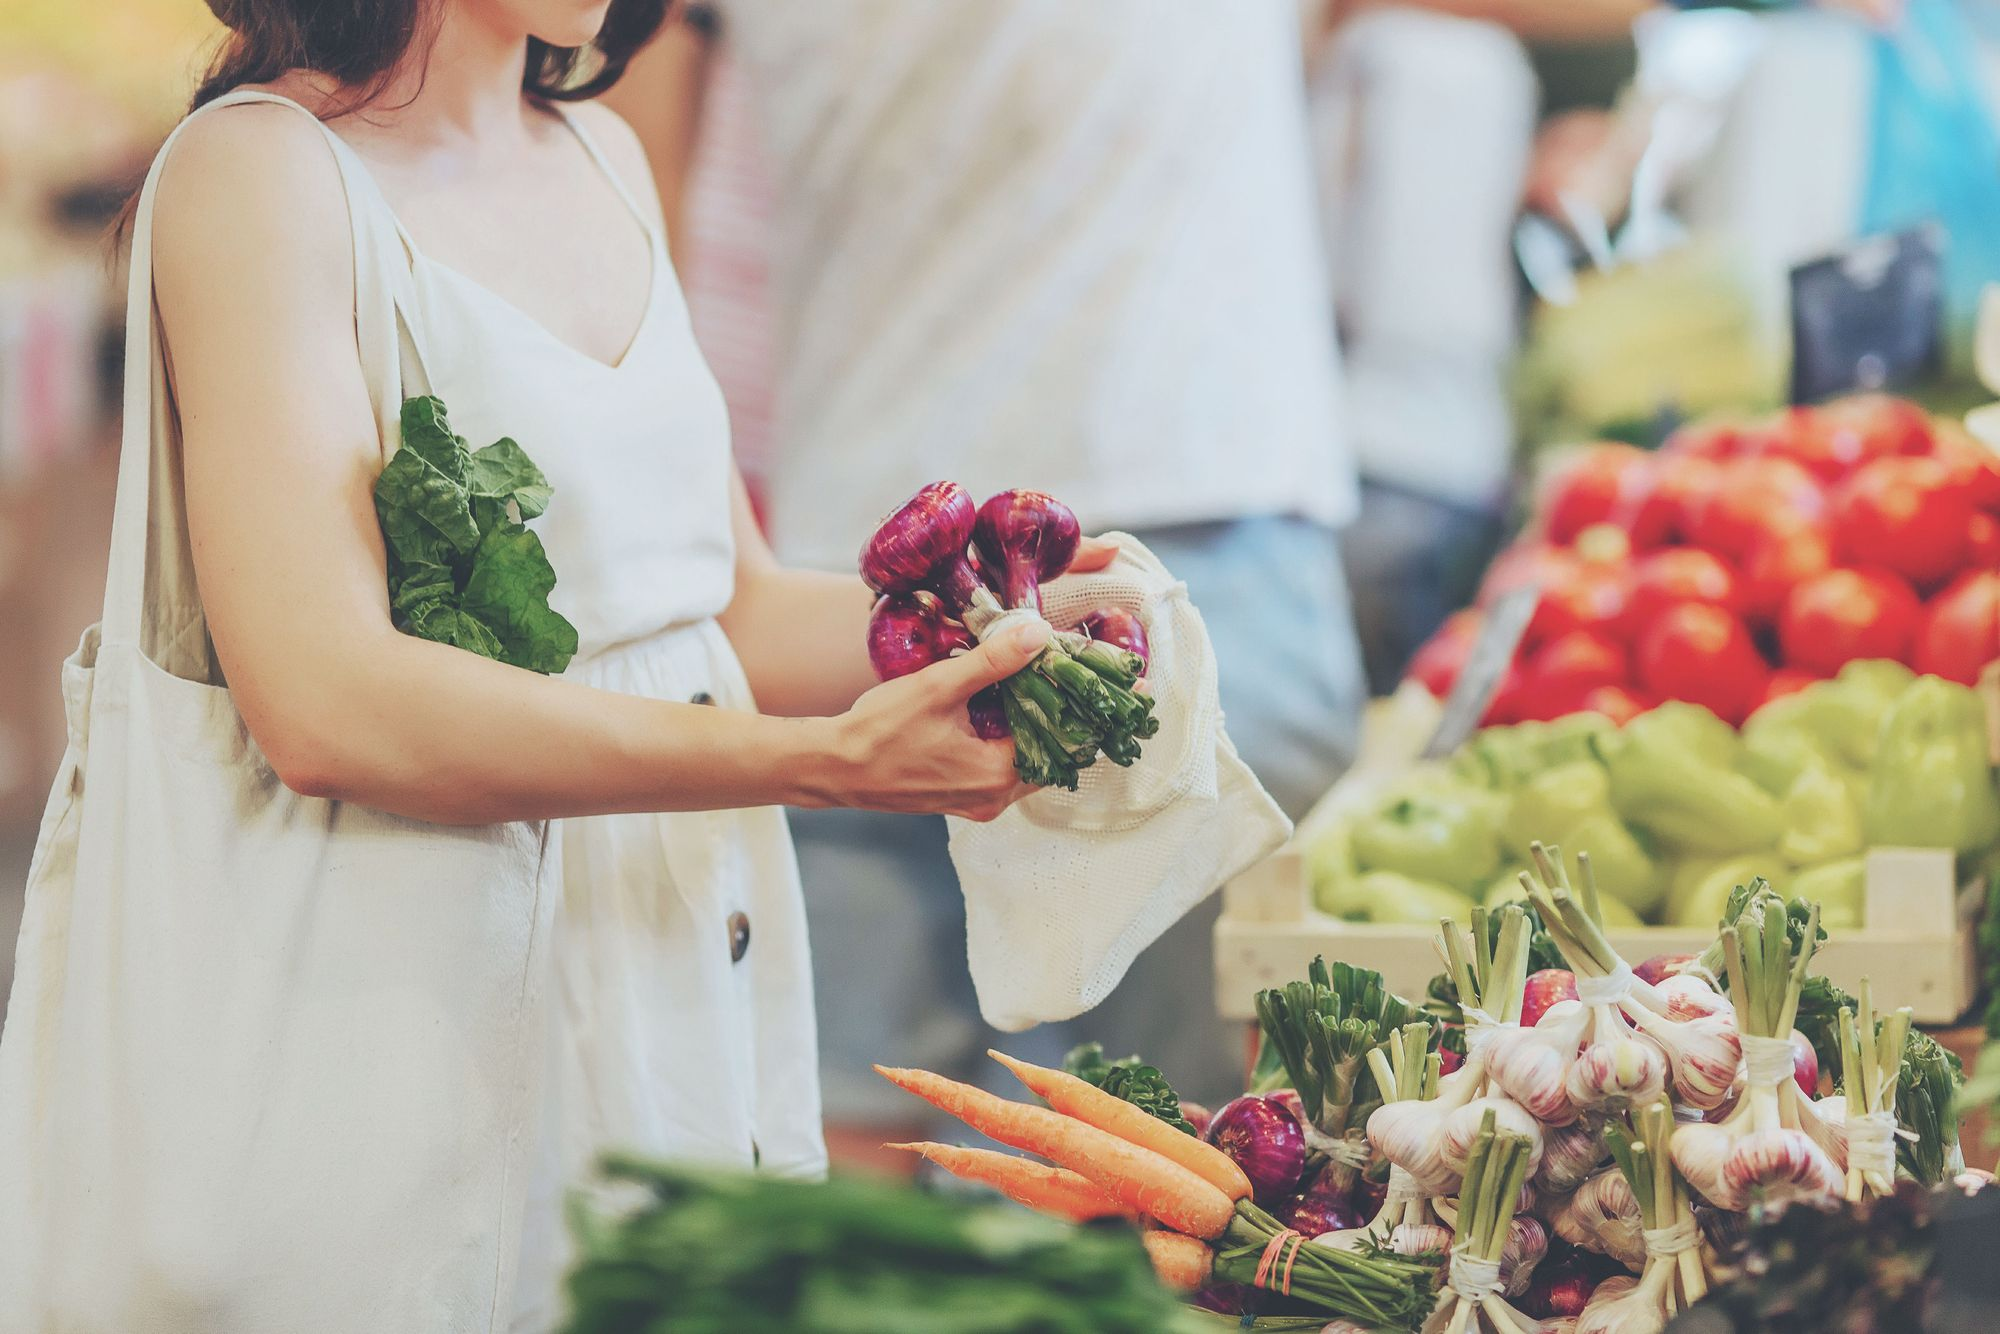 Women healthy food shopping